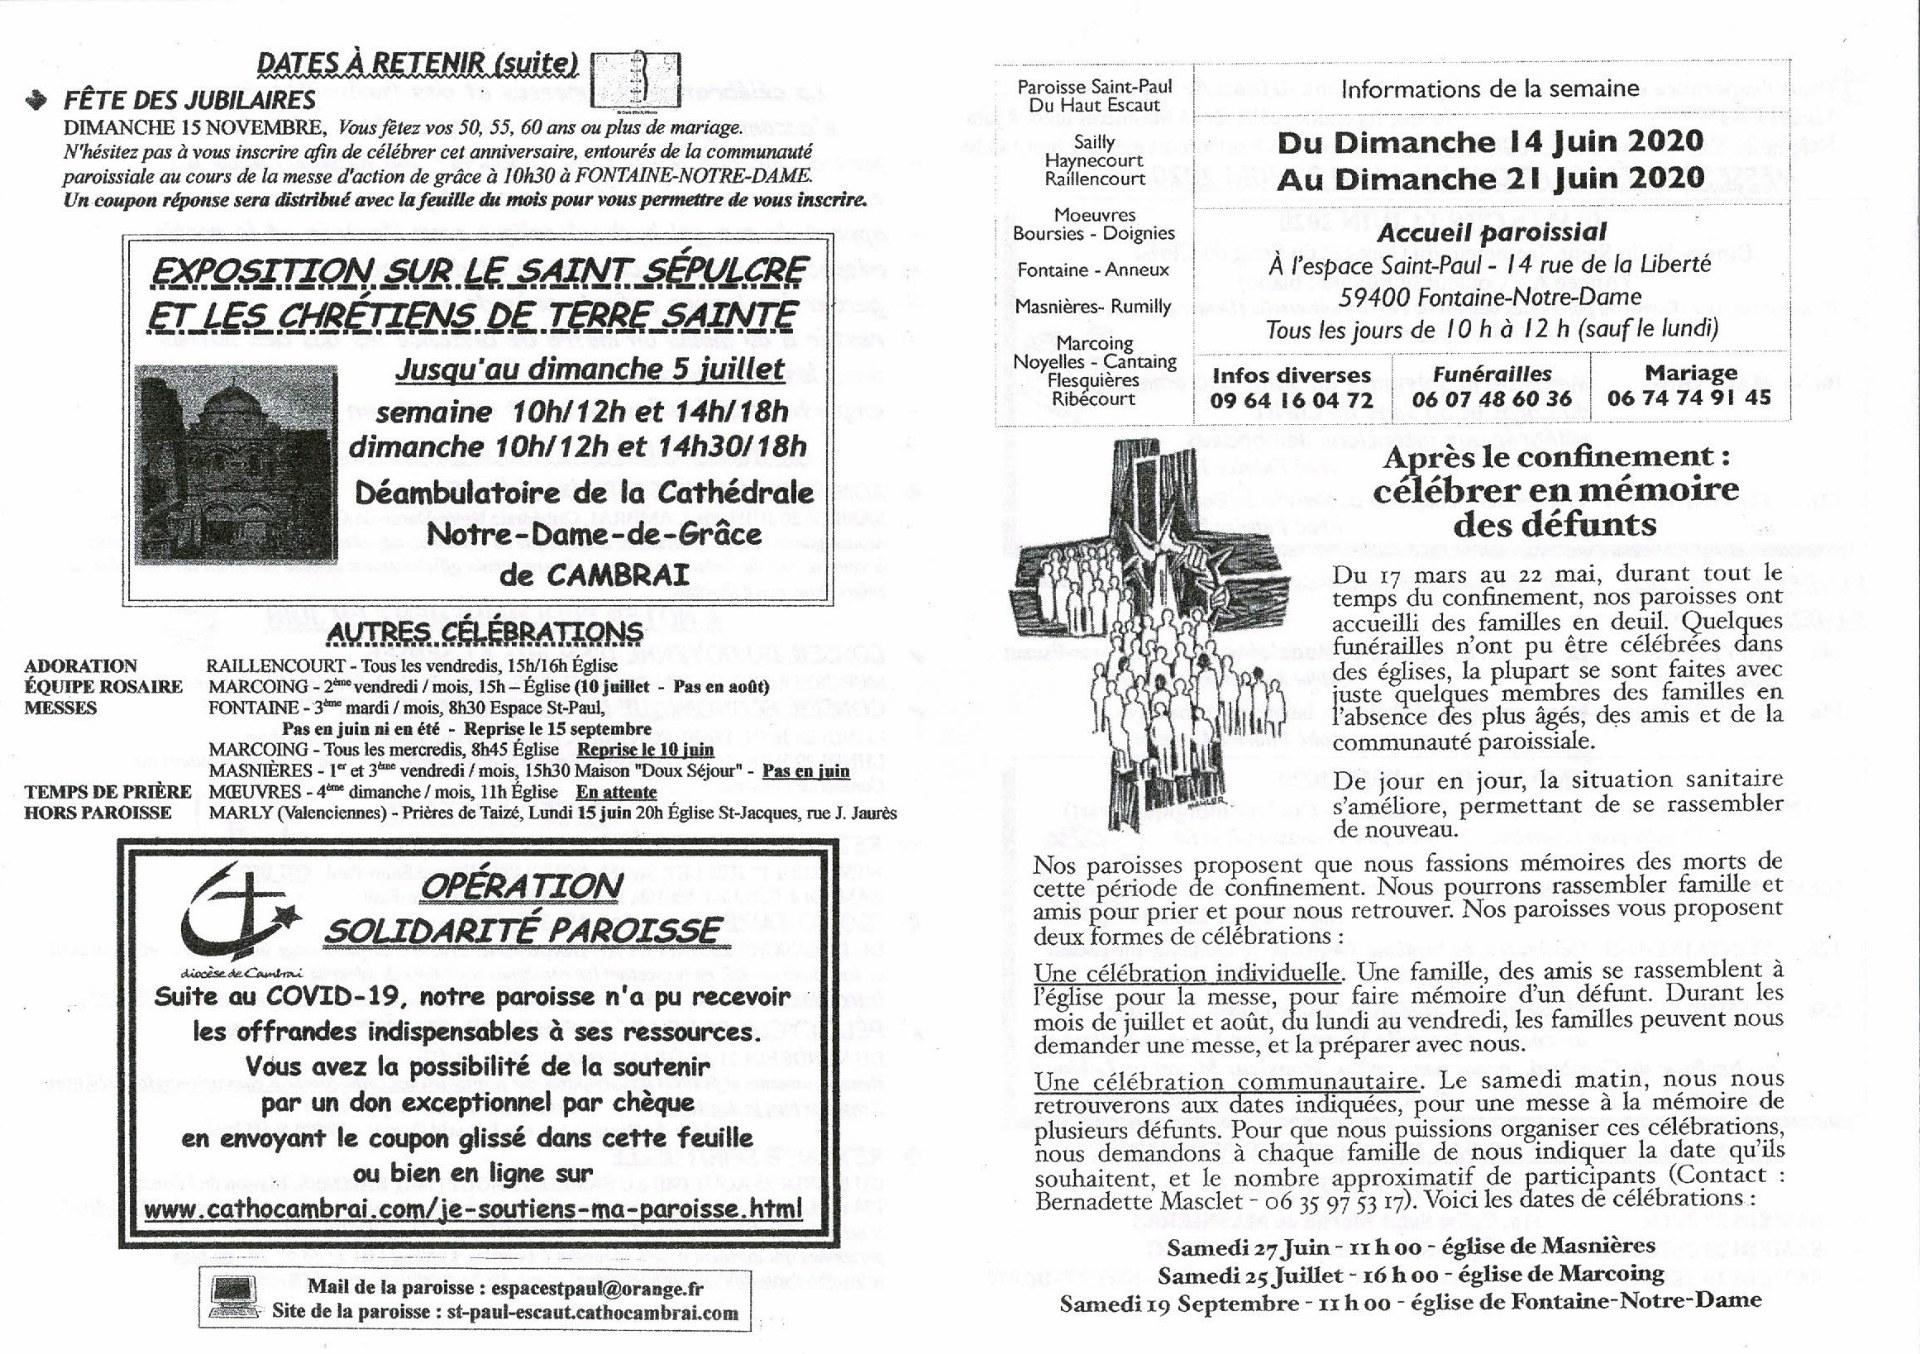 feuille hebdo du dimanche 14 juin 2020-1